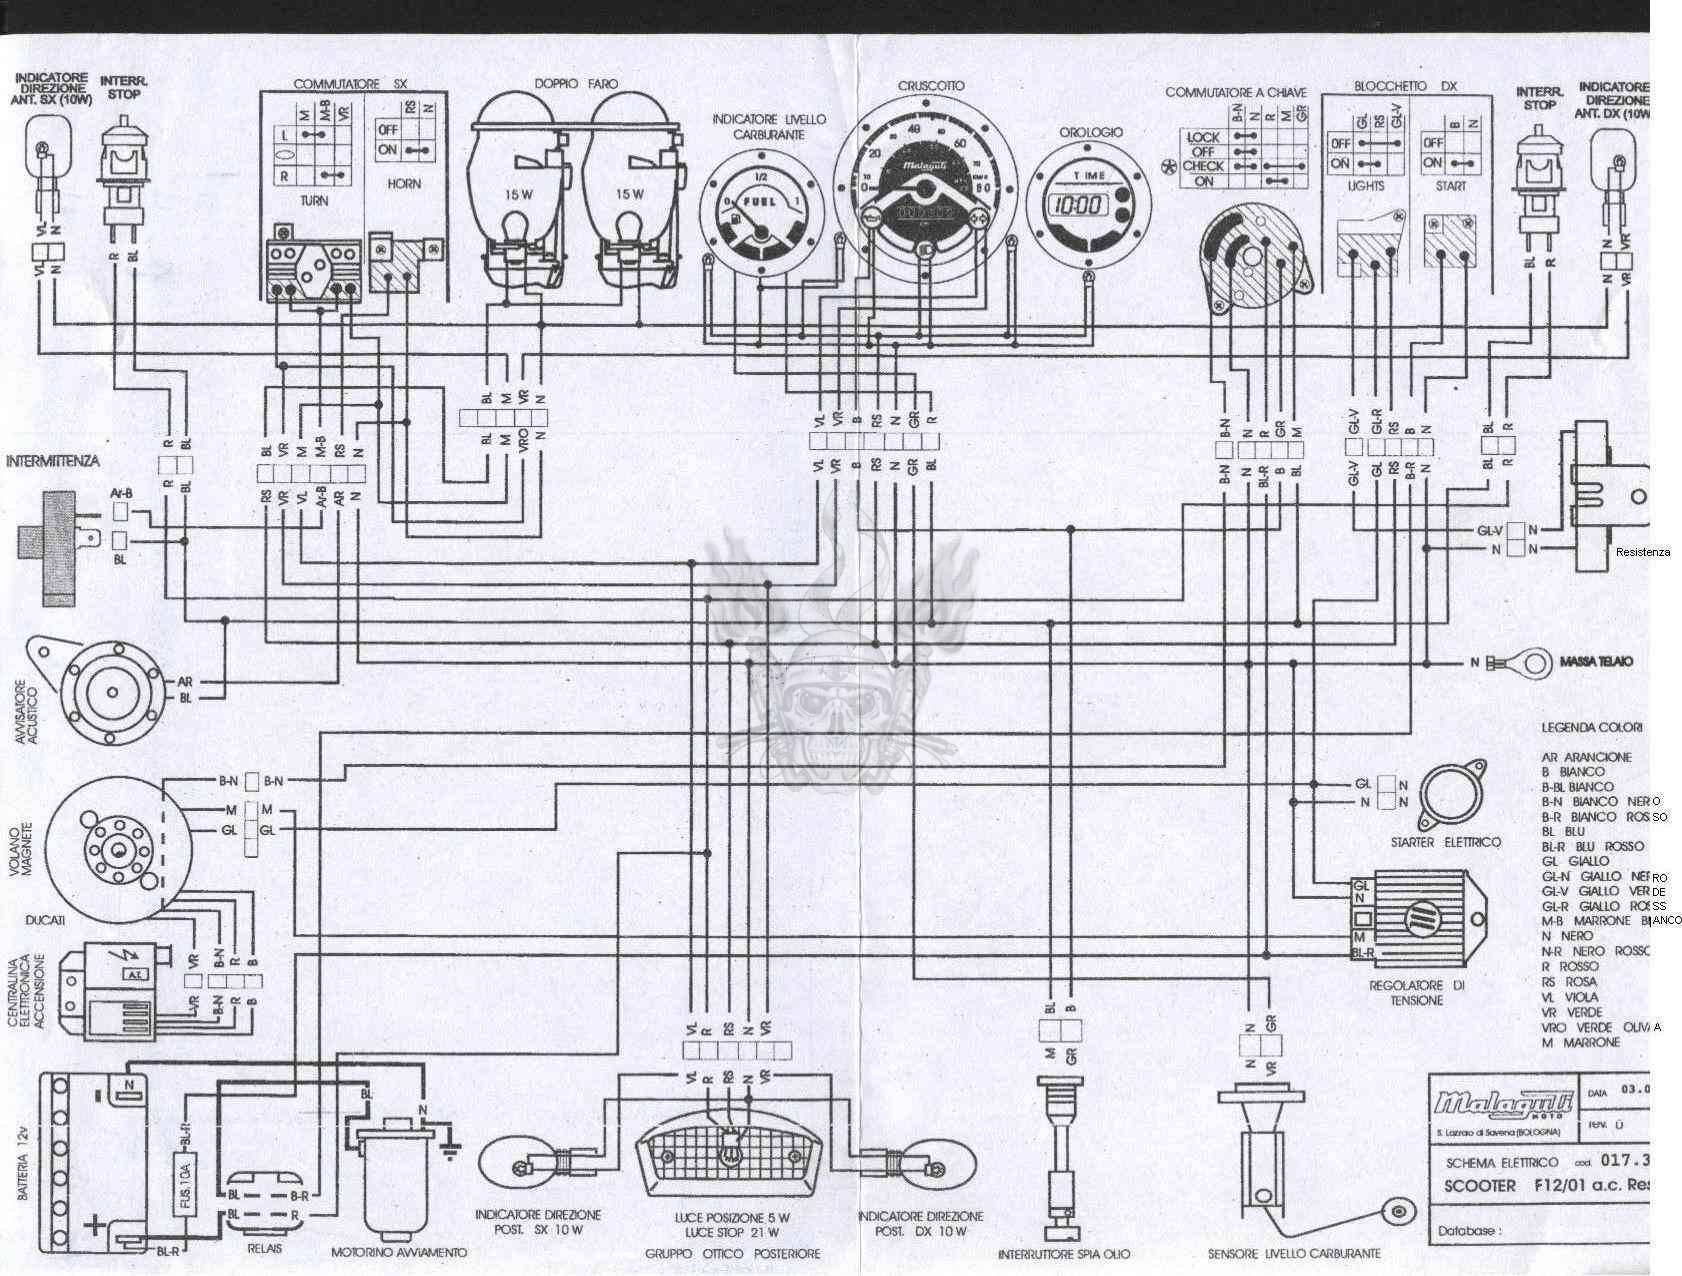 hight resolution of malaguti motorcycle manuals pdf wiring diagrams u0026 fault codes mix download moto schem malaguti f12 phantom ac bj01 scooter